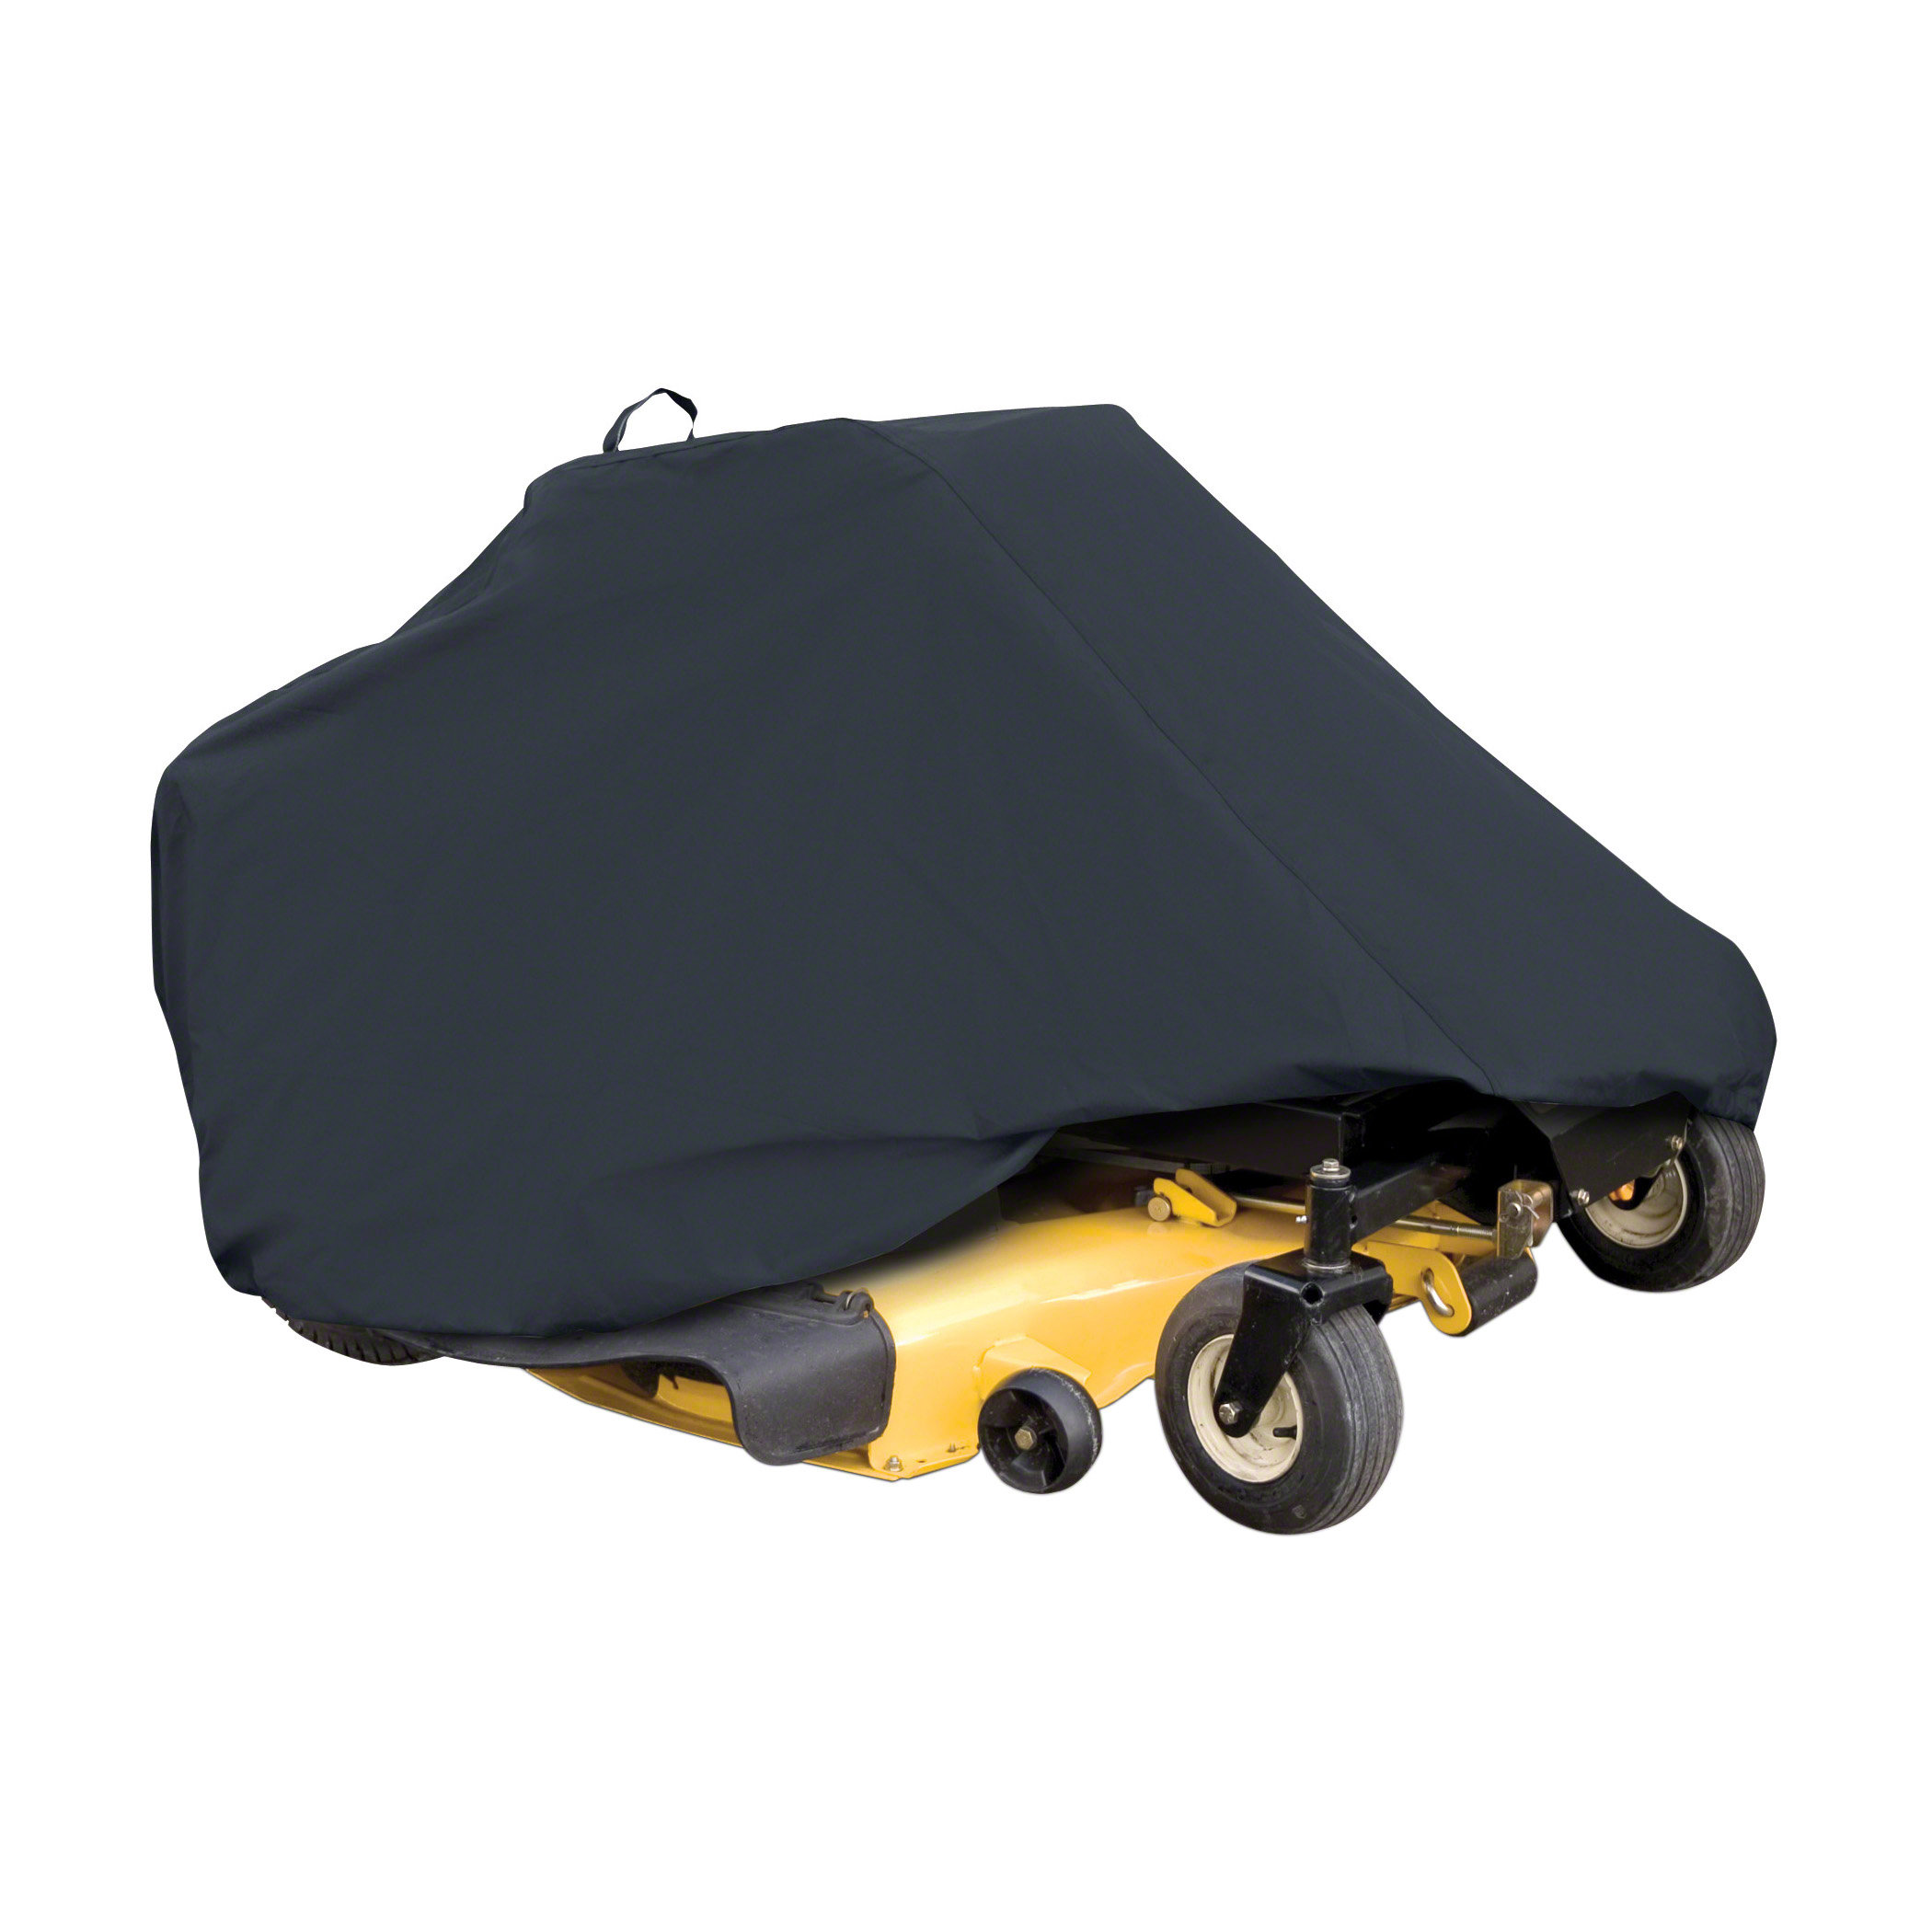 Classic accessories zero turn mower cover 73997 brand new for Lawn garden accessories